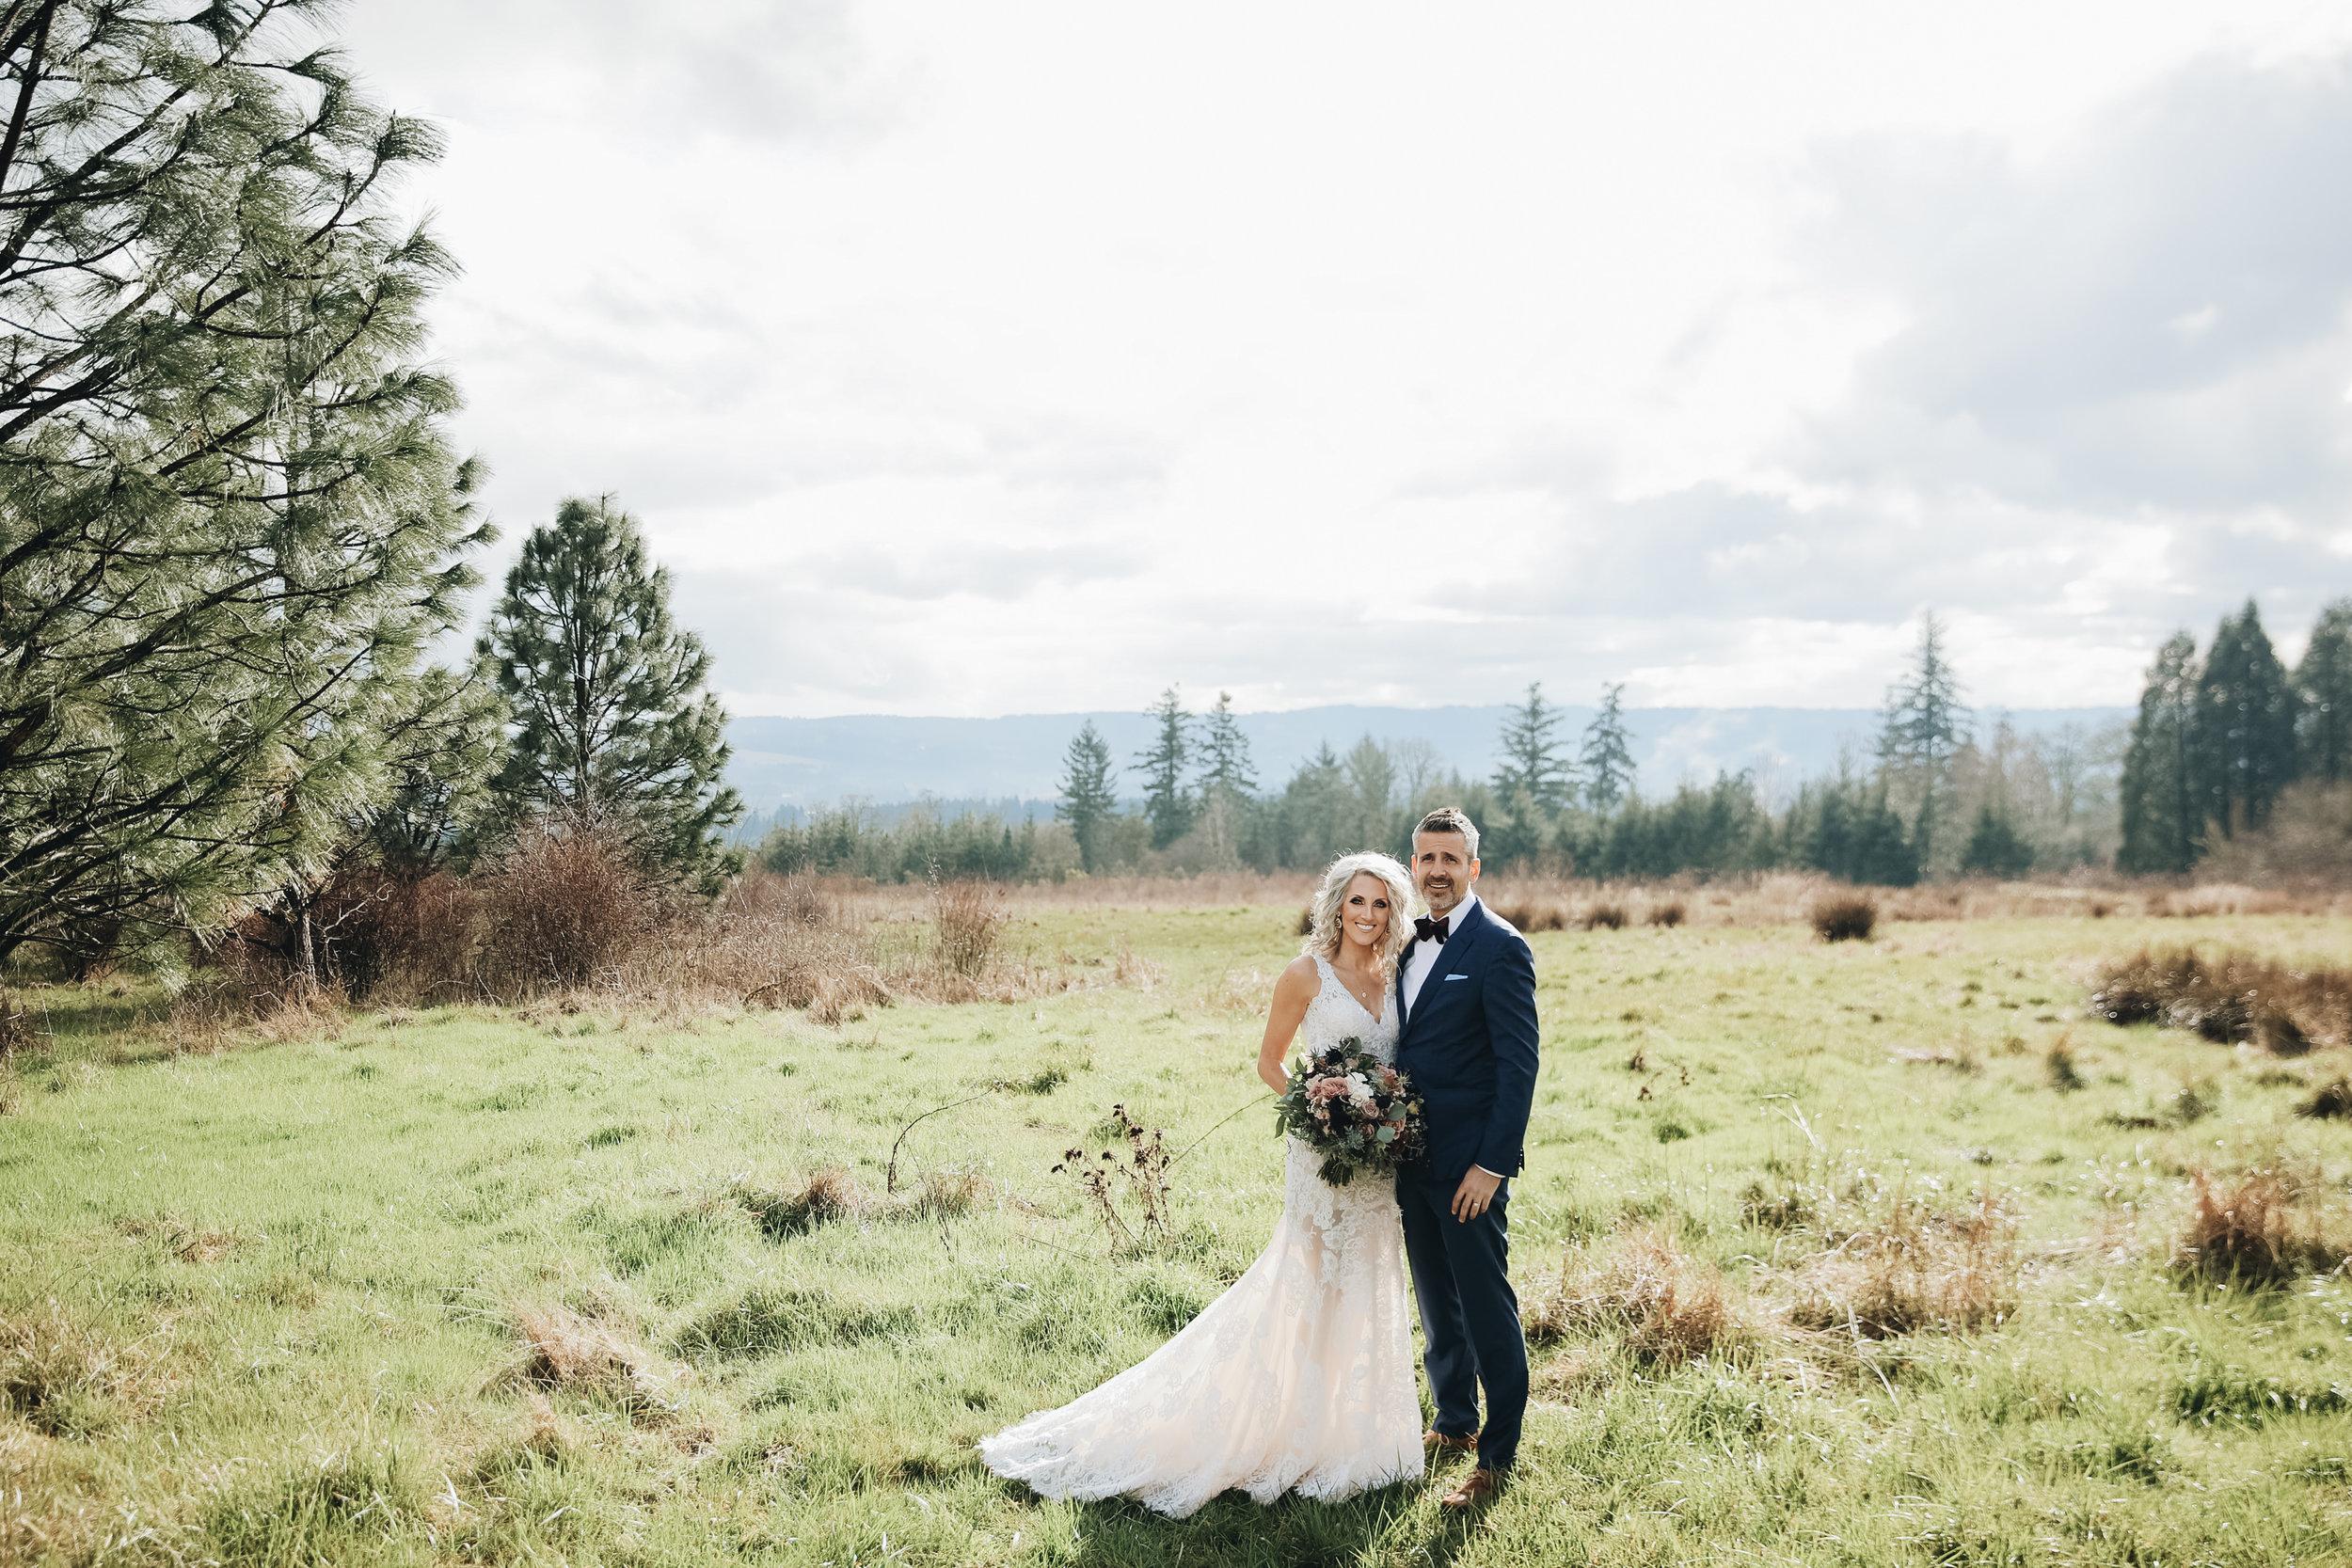 Bridalbliss.com | Portland Wedding | Oregon Event Planning and Design |  Dina Chmut Photography